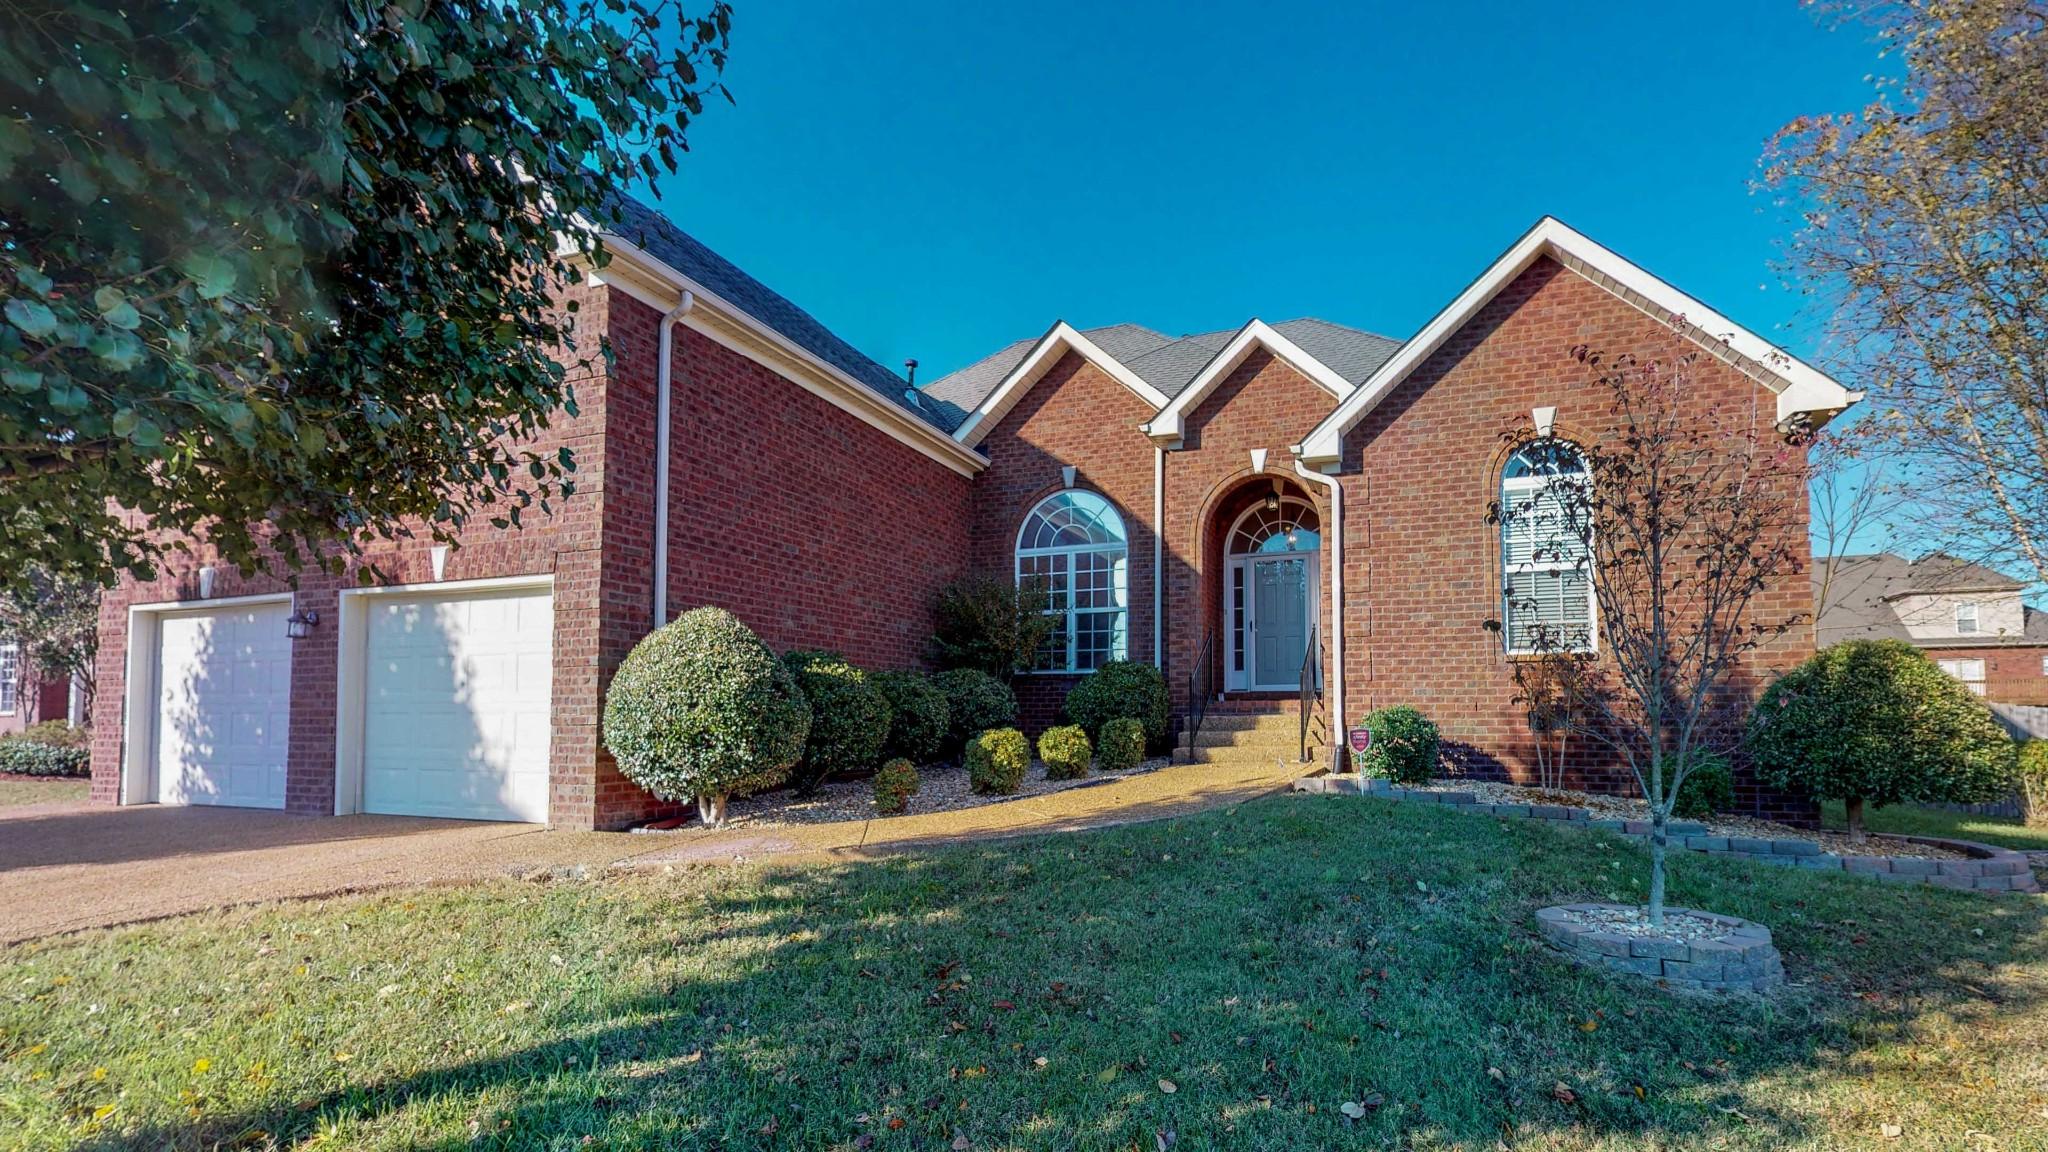 6006 Quincy Ct, LA VERGNE, TN 37086 - LA VERGNE, TN real estate listing